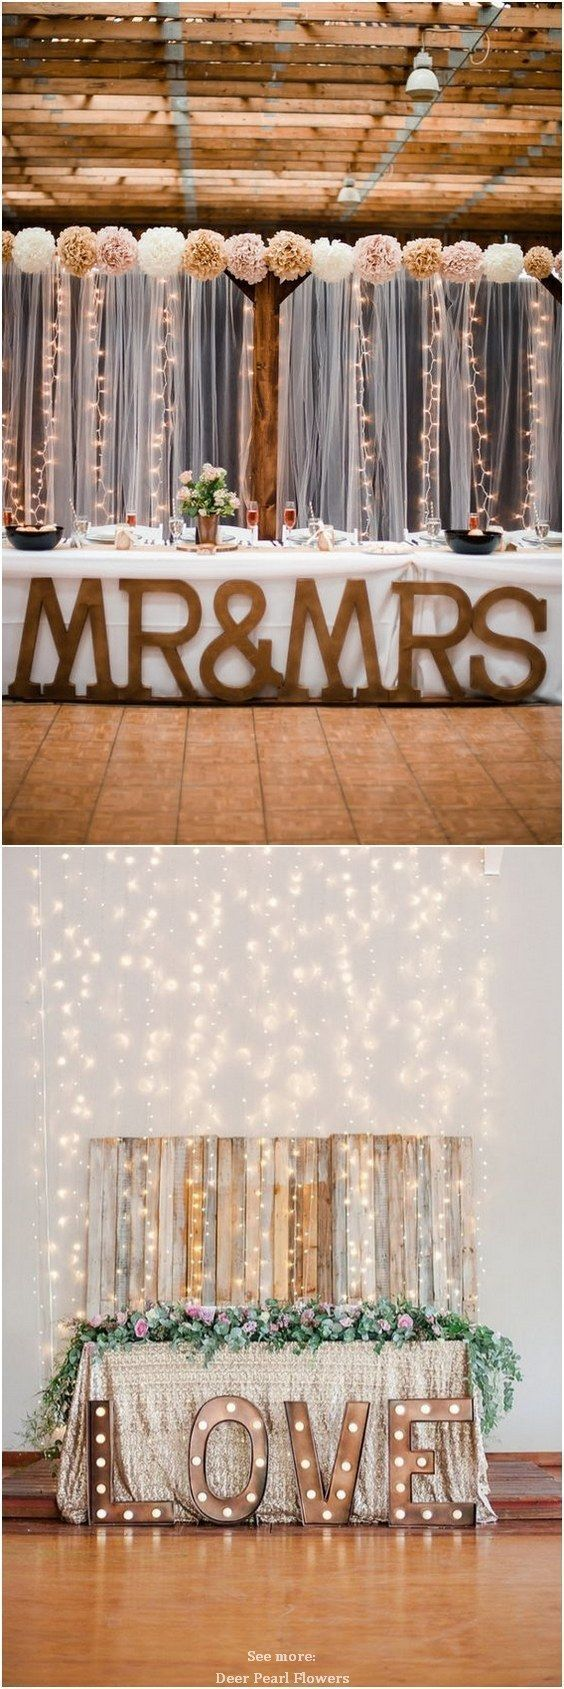 Top 20 Rustic Country Wedding Sweetheart Table Ideas Eskvi